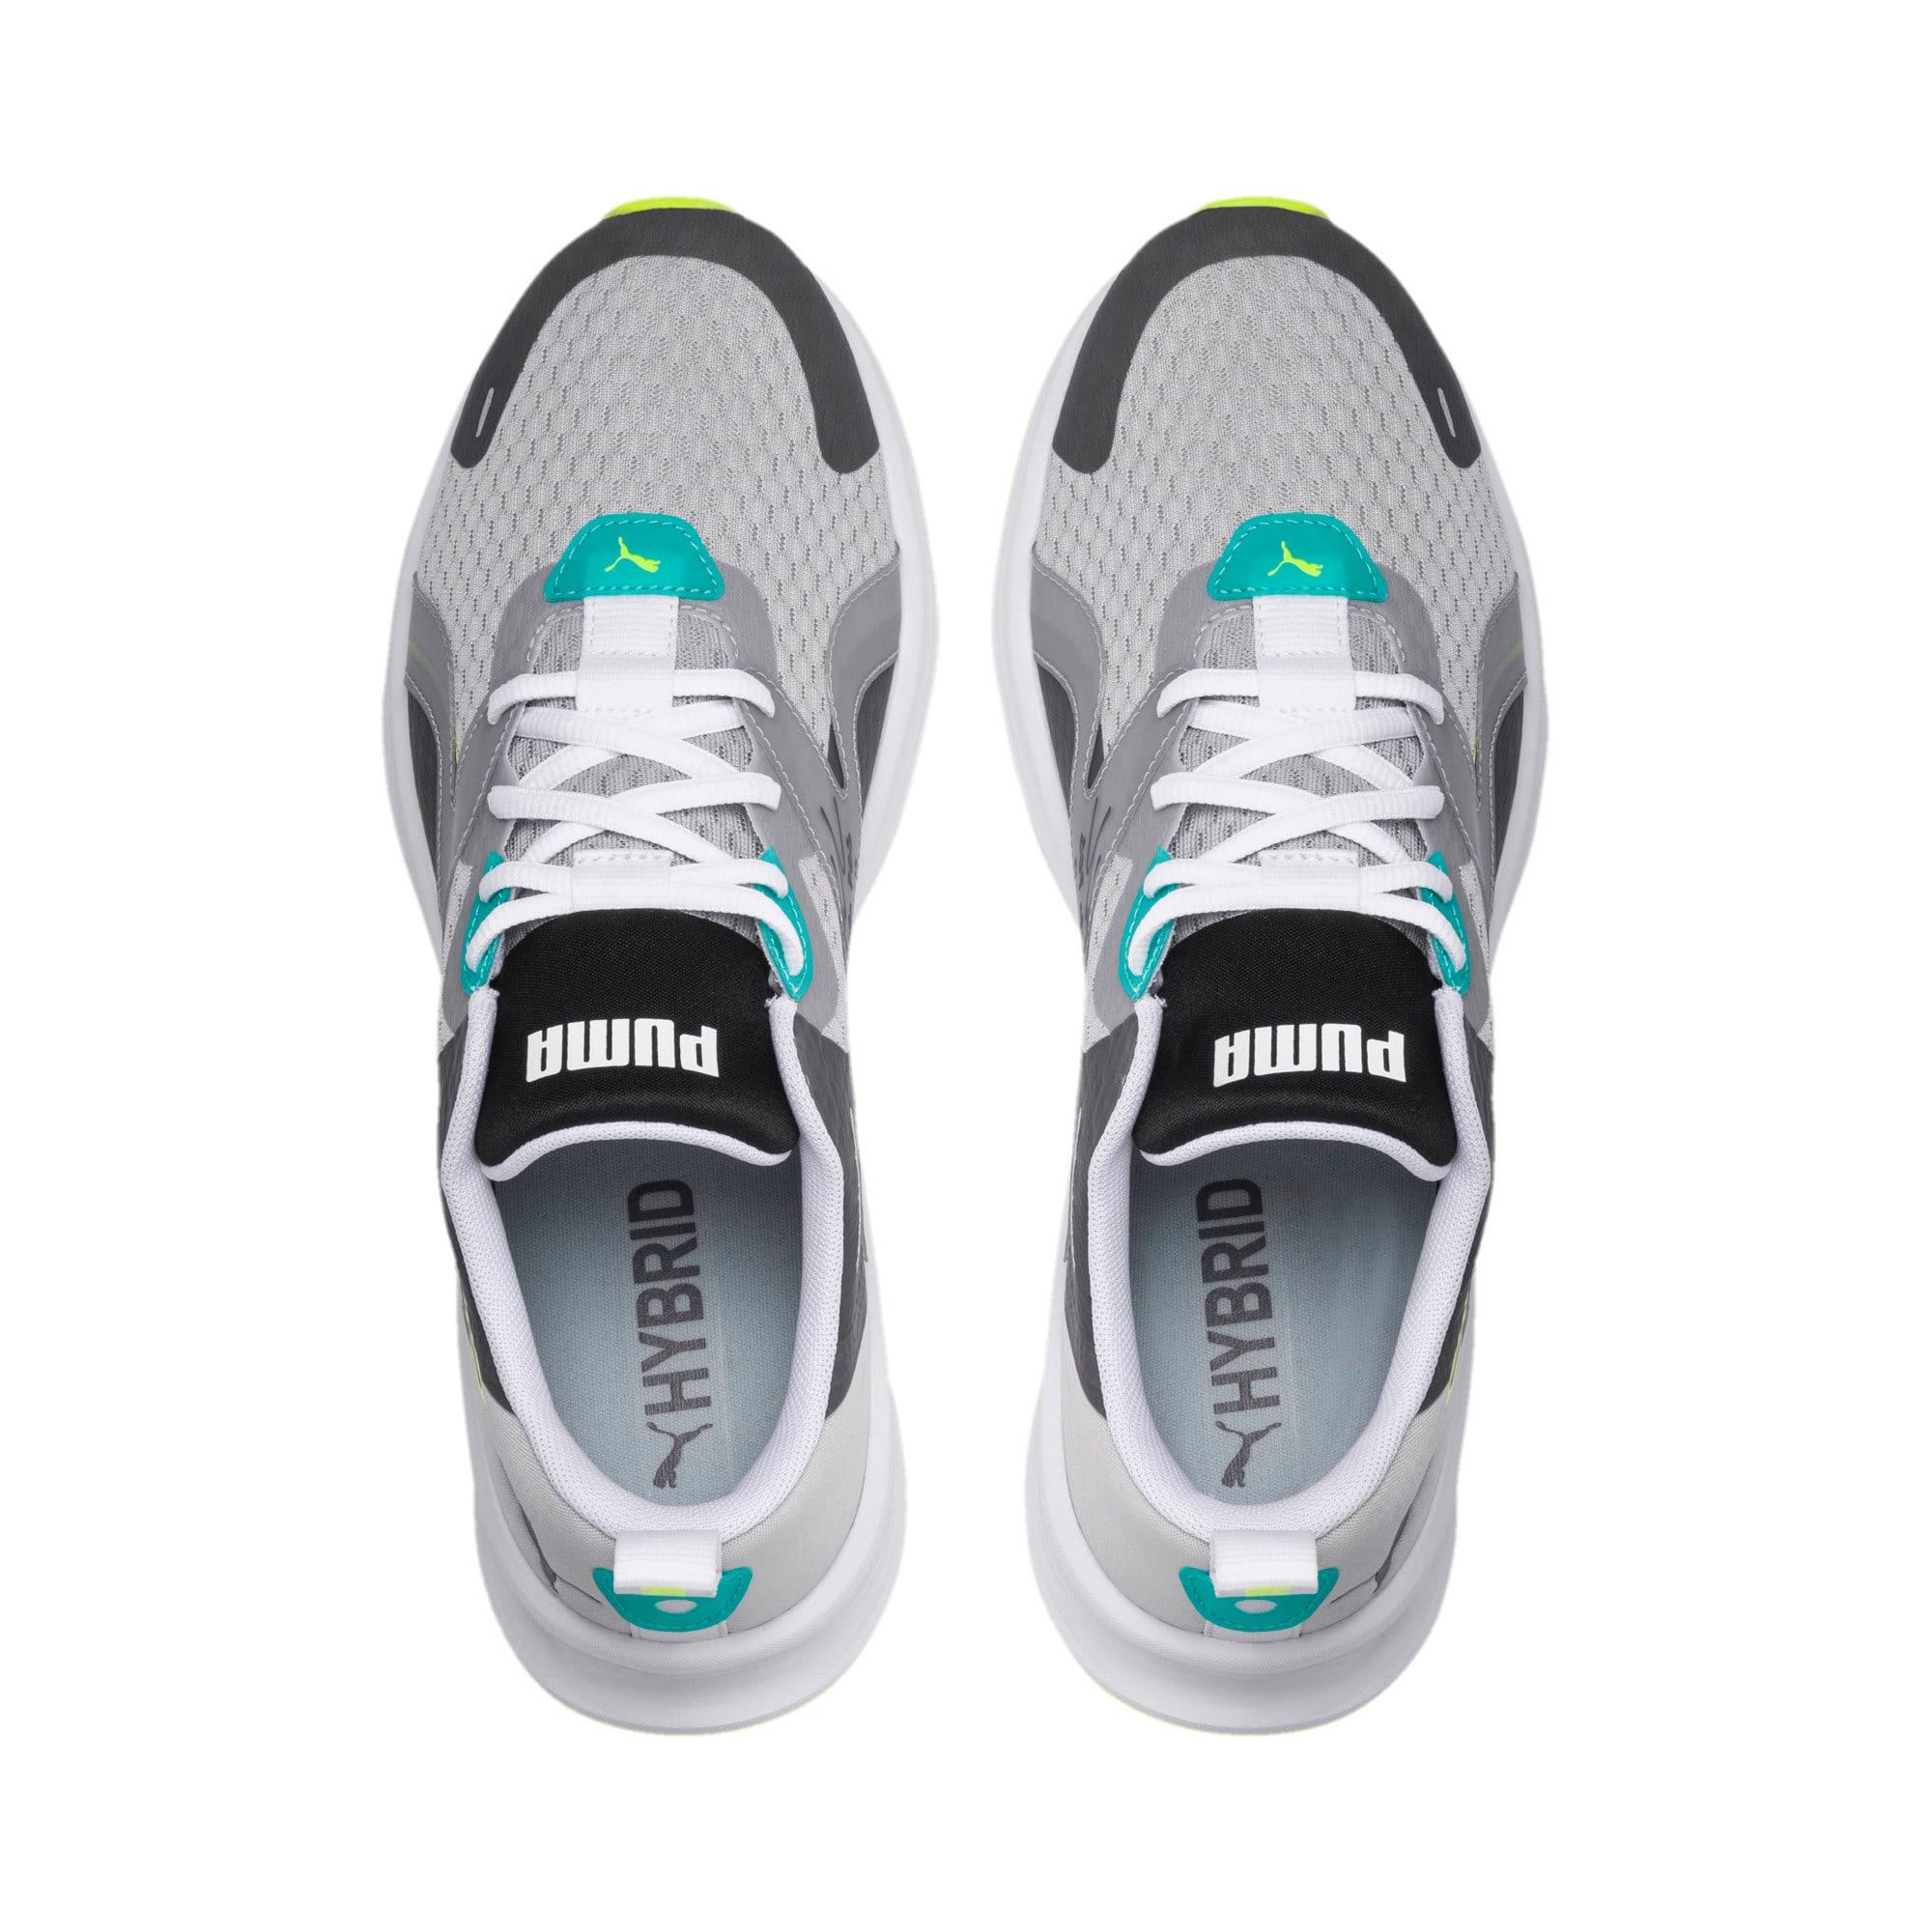 Thumbnail 6 of HYBRID Fuego Men's Running Shoes, High Rise-Blue Turquoise, medium